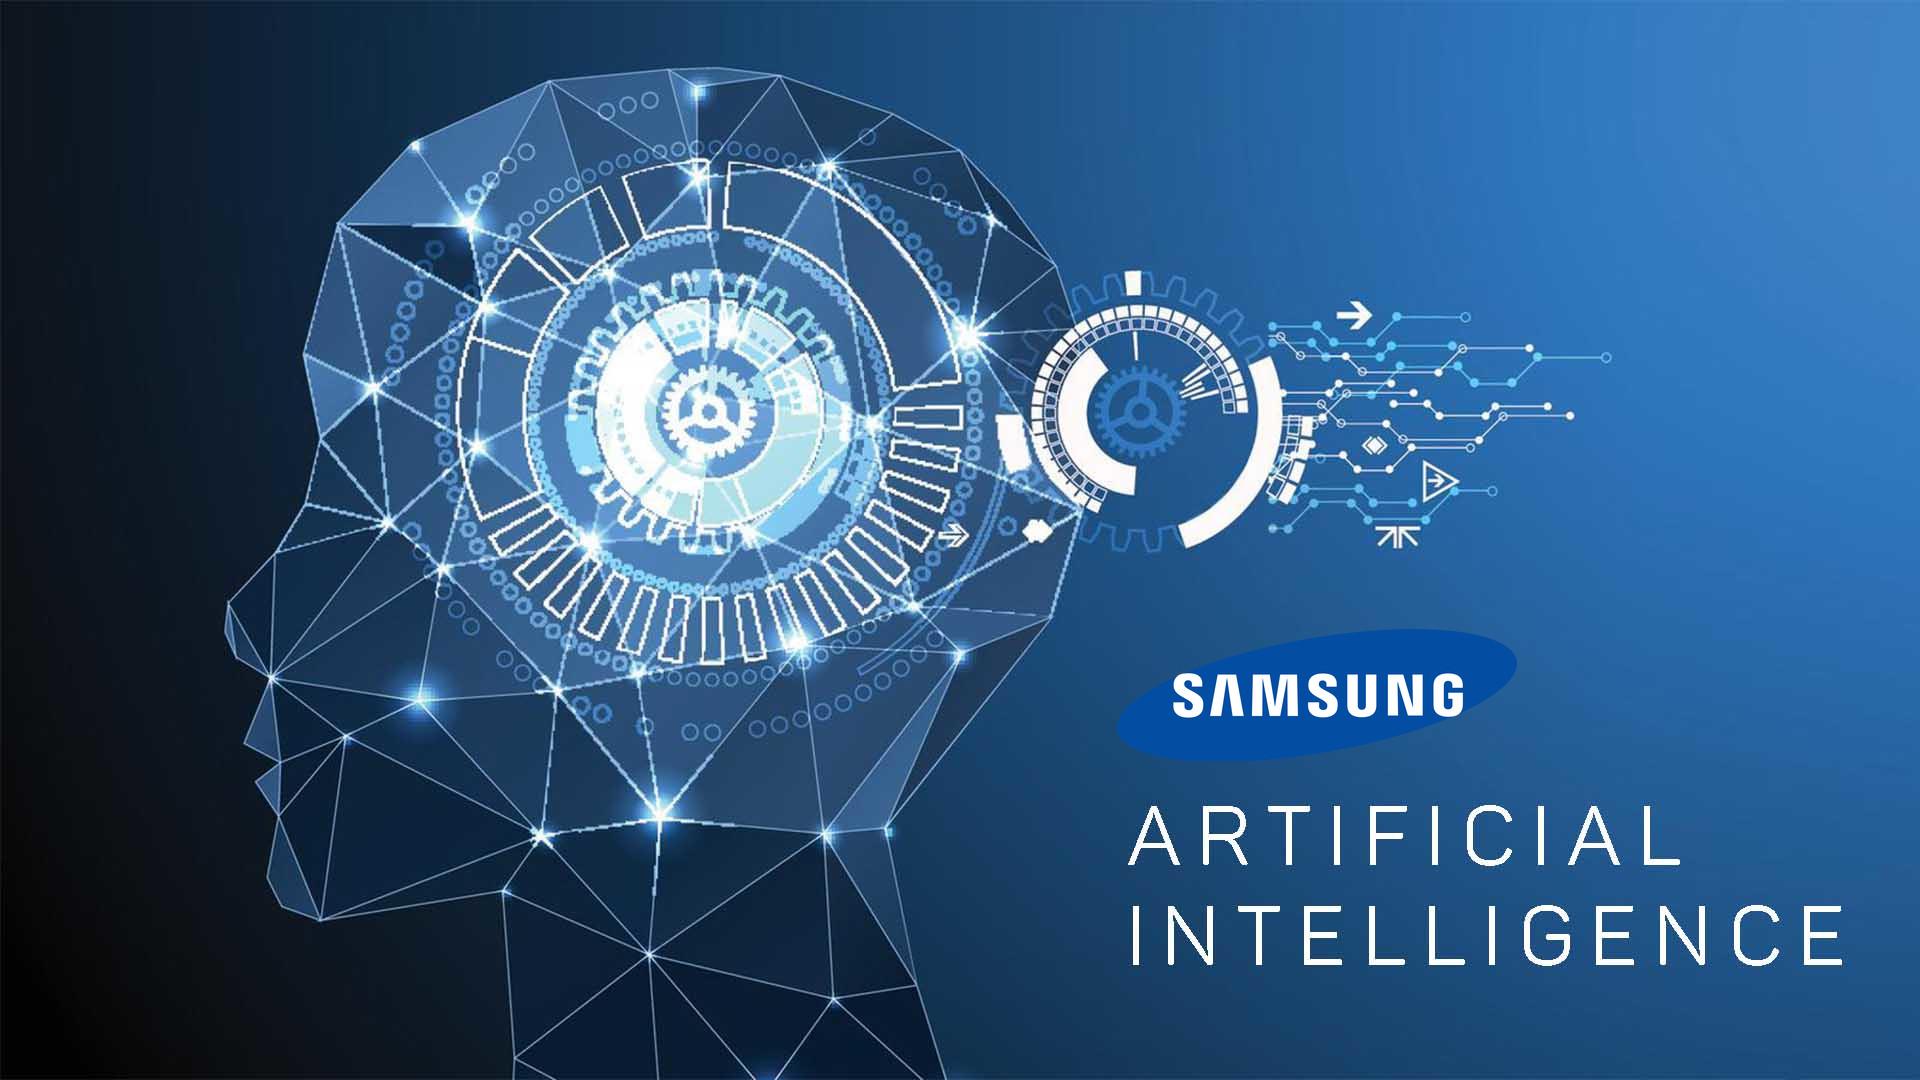 Samsung Exynos 9280 umjetna inteligencija npu ai - Naslovna